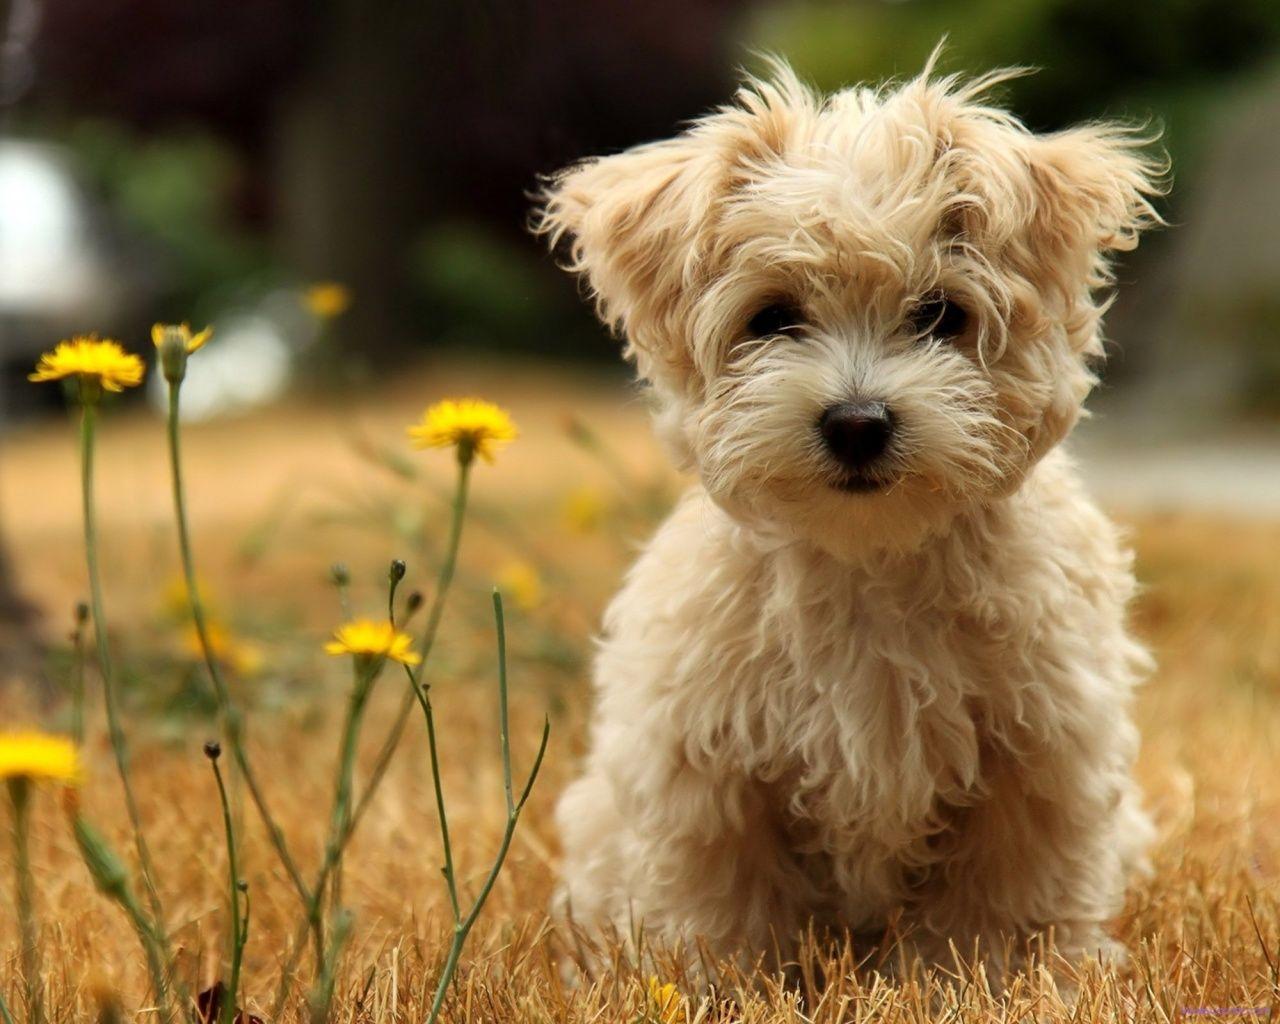 Stricklandinternational Com Cute Animals Fluffy Puppies Puppies